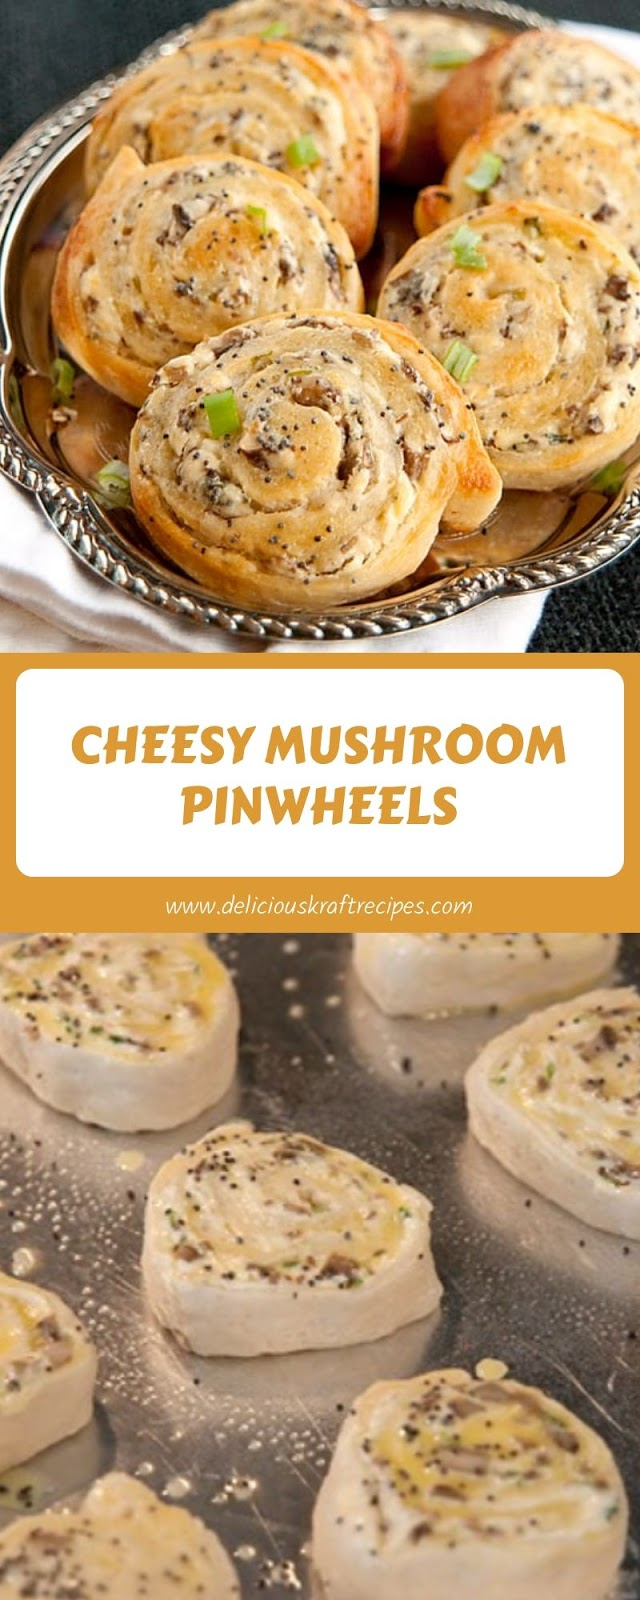 CHEESY MUSHROOM PINWHEELS